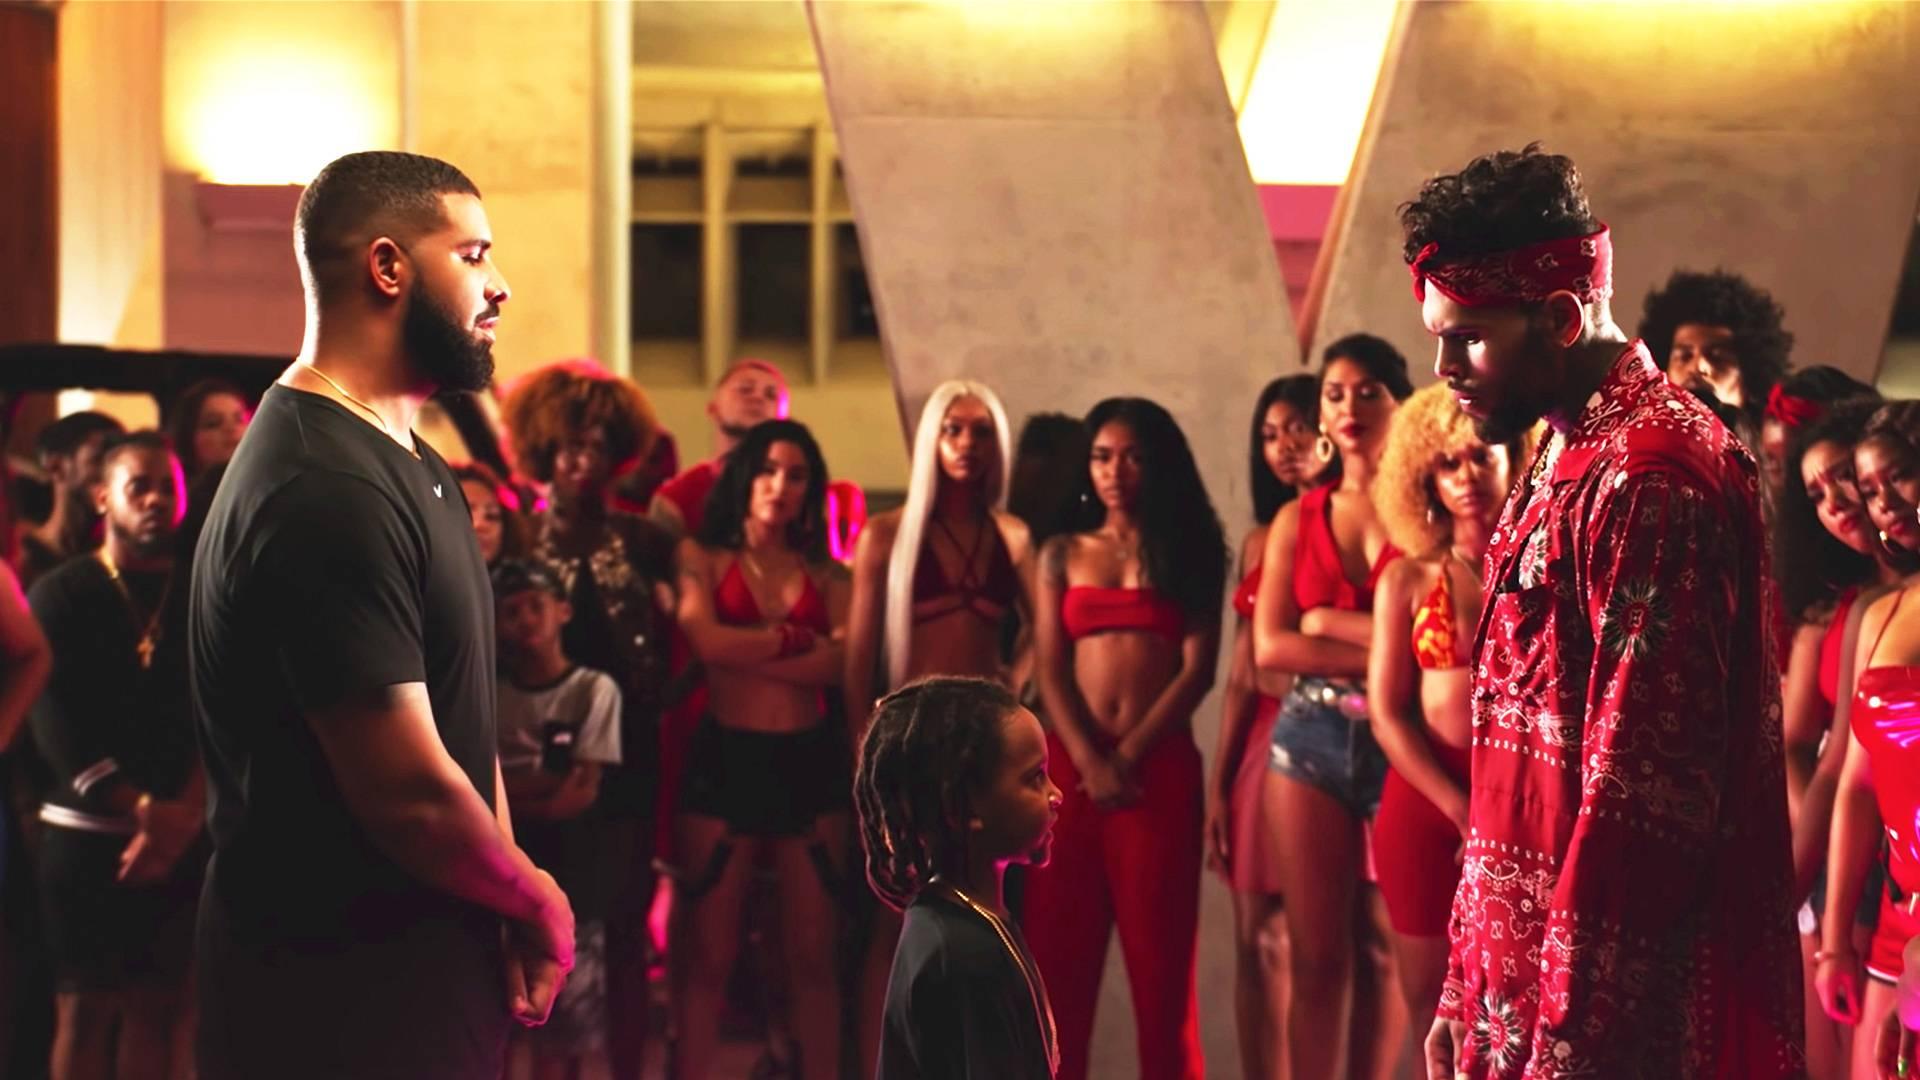 BETA 2020 | Winners Flipbook | Chris Brown and Drake | 1920x1080